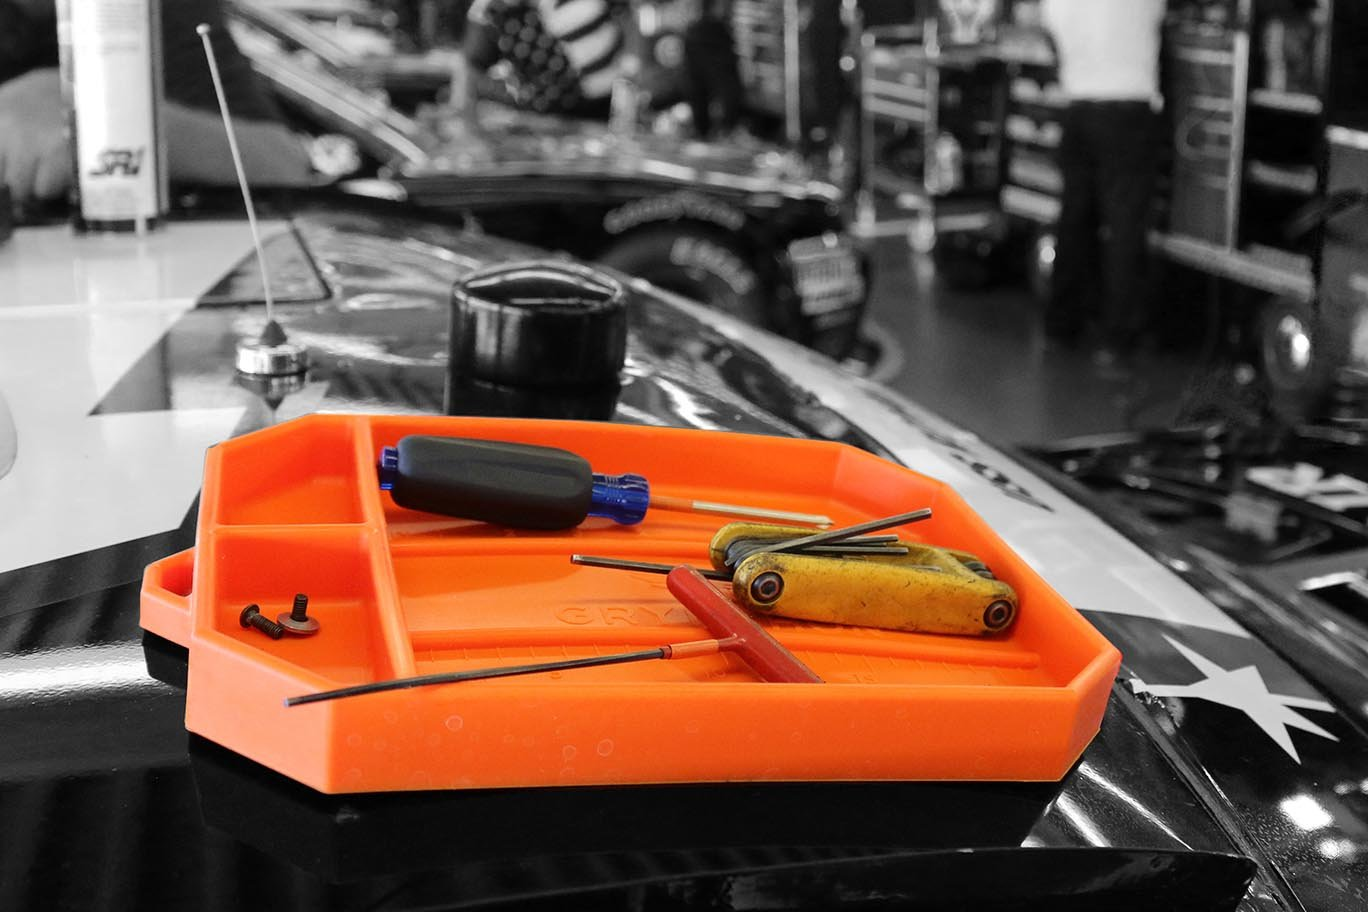 Grypmat | Non-Slip Flexible Orange Tool Tray | Tool Box Organizer | Socket Organizer | Tool Holder | Tool Mats | No Magnets | Easy Clean Up | As Seen On Shark Tank (Medium) by Grypshon (Image #4)